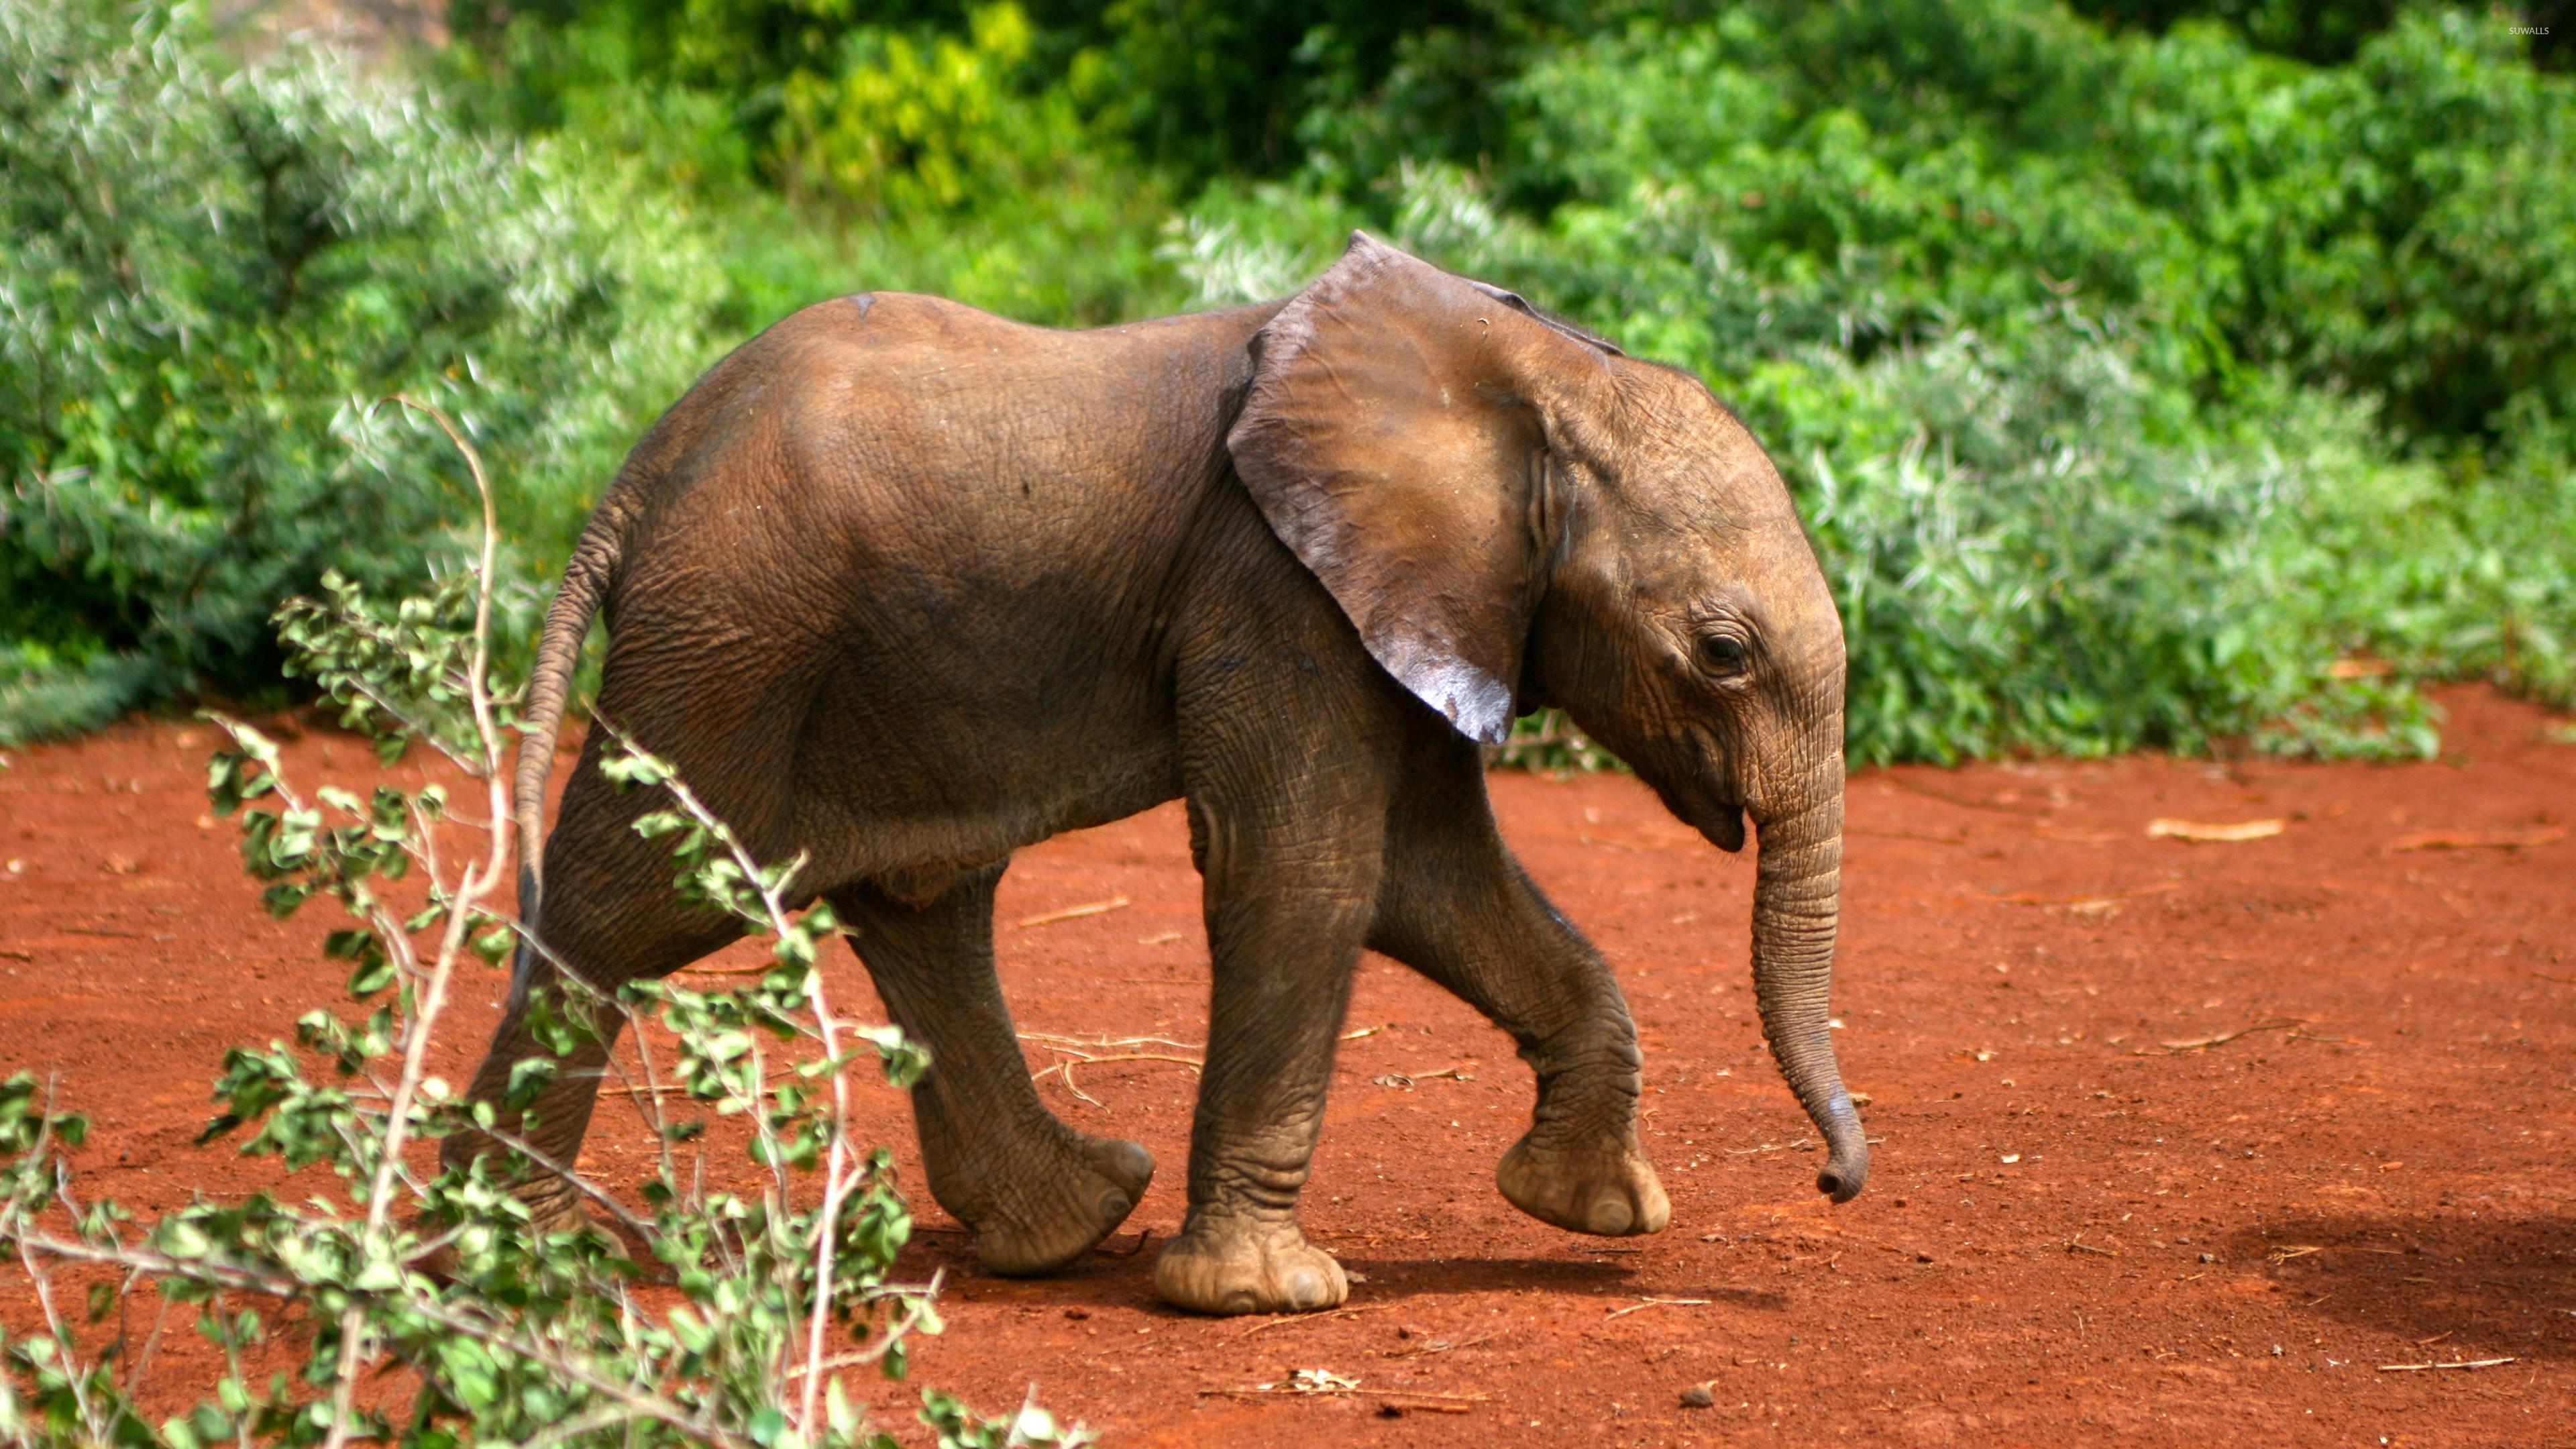 1920x1080 Explore Elephant Wallpaper Tiger And More Download